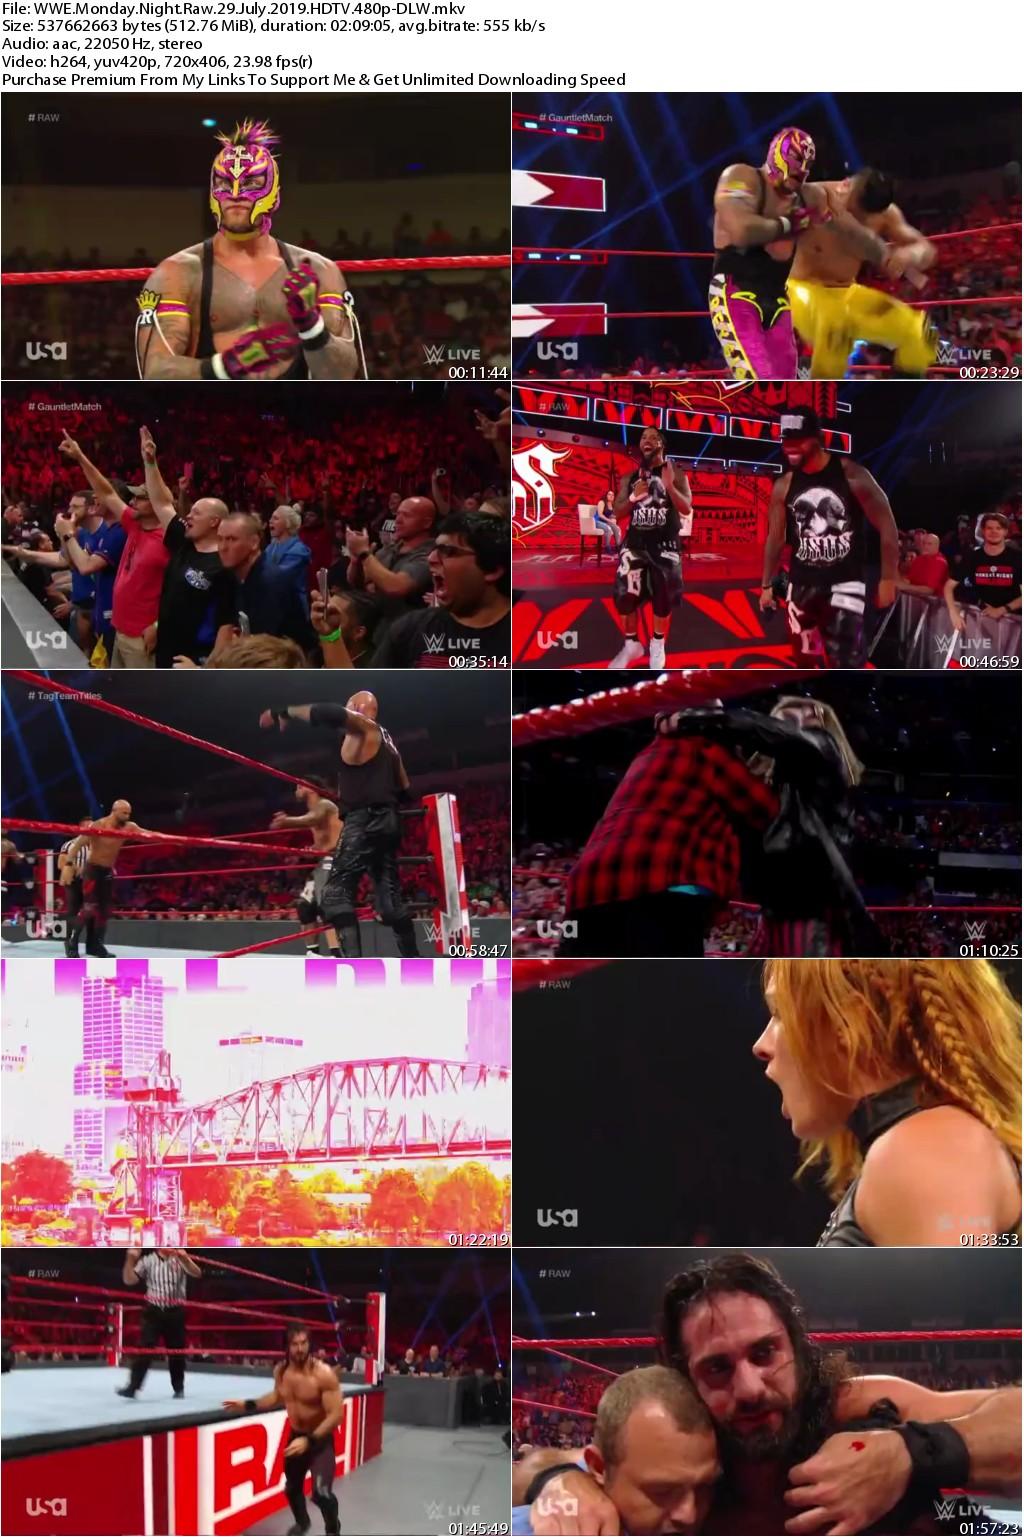 WWE Monday Night Raw 29 July 2019 HDTV 480p-DLW